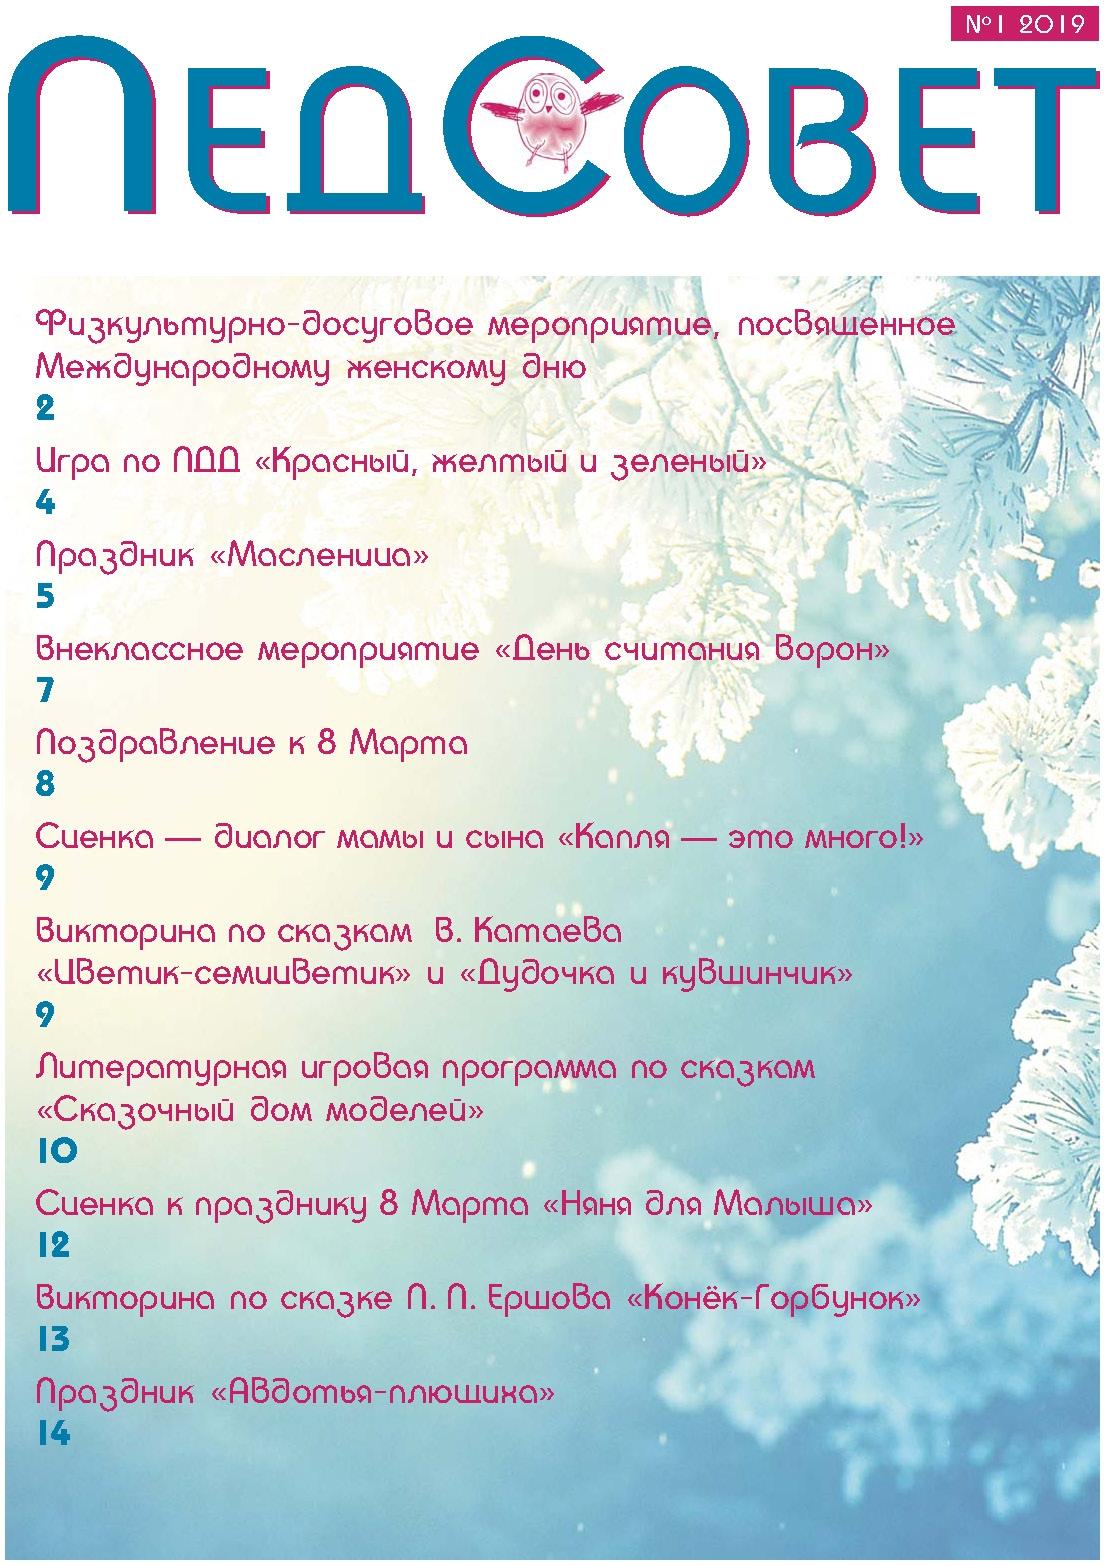 Педсовет №1/2019